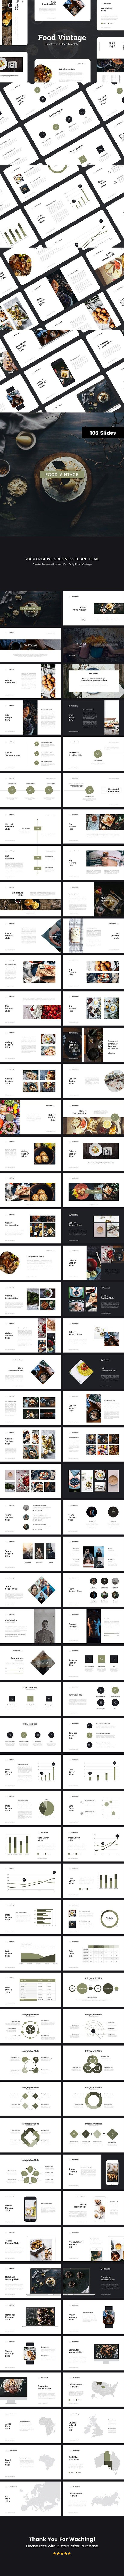 Food Vintage Presentation Template. Google Slides Templates. $20.00